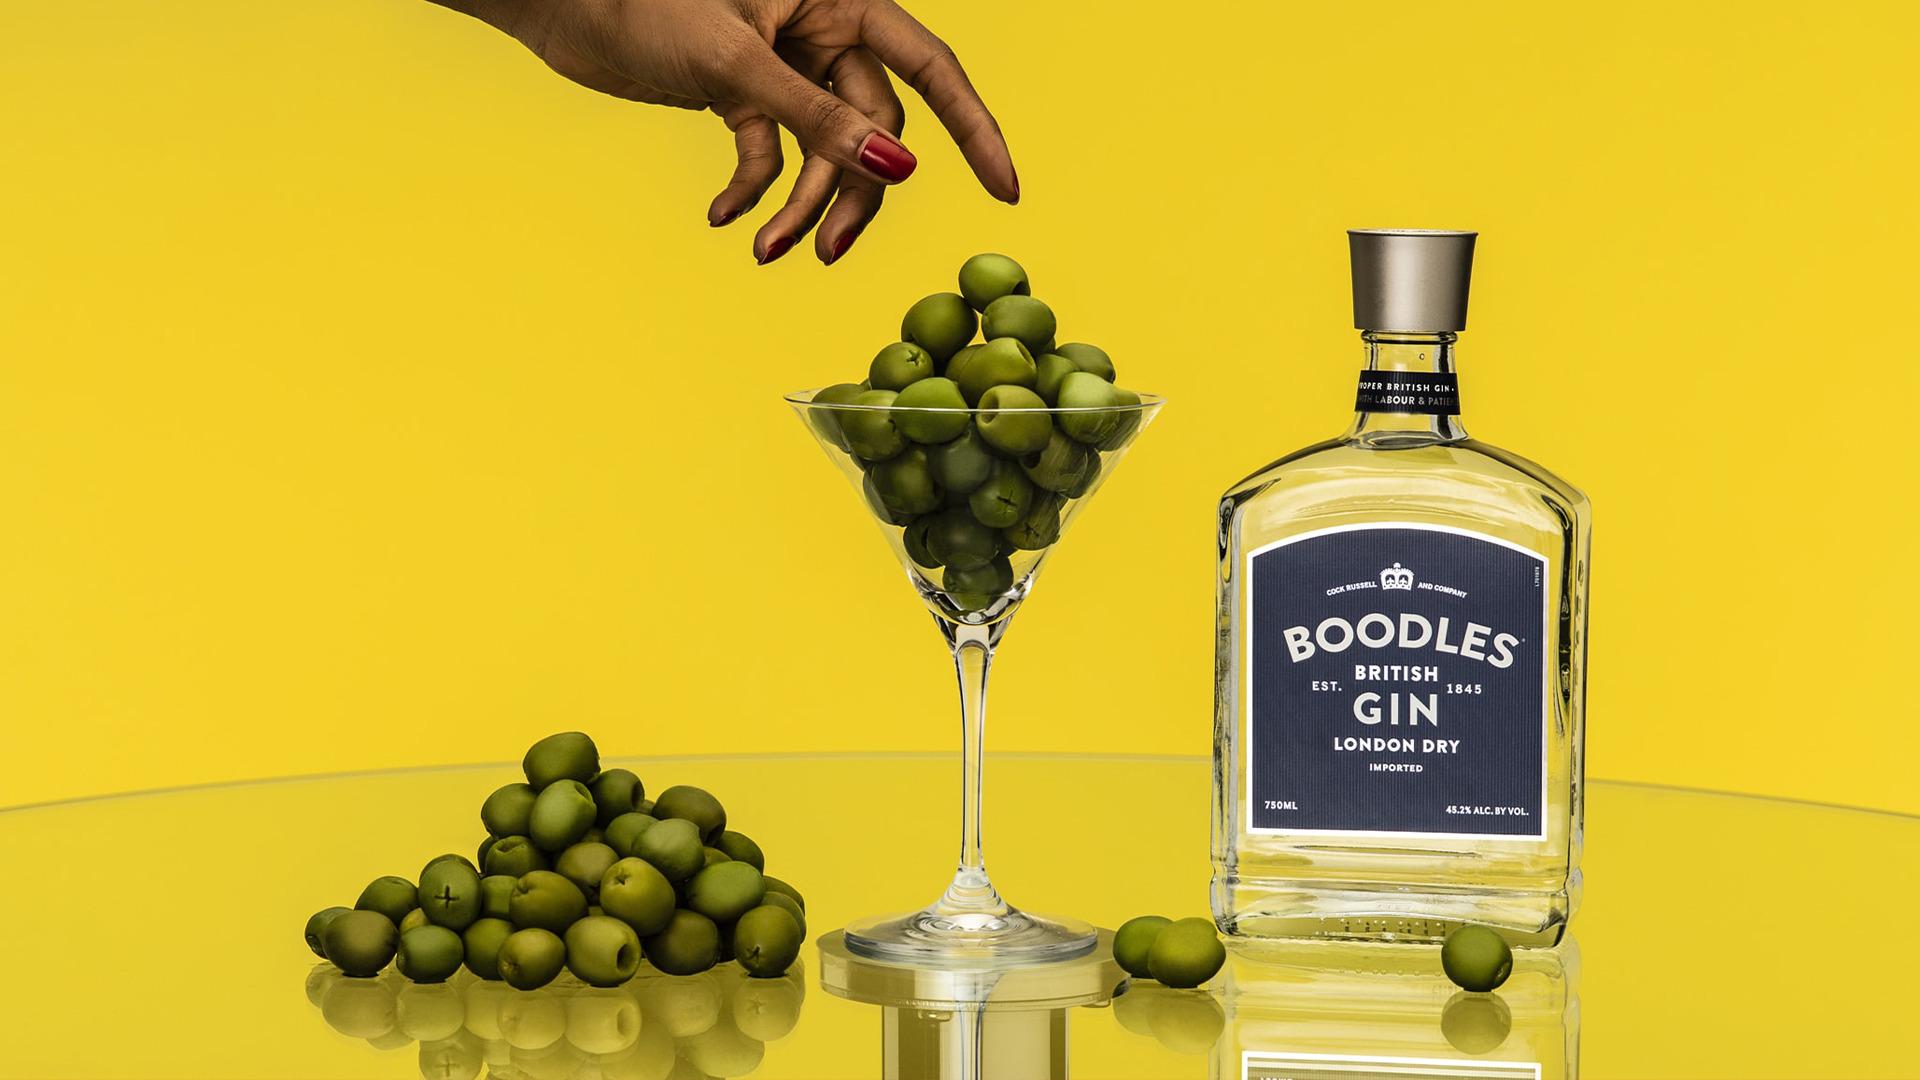 Rượu Boodles British Gin